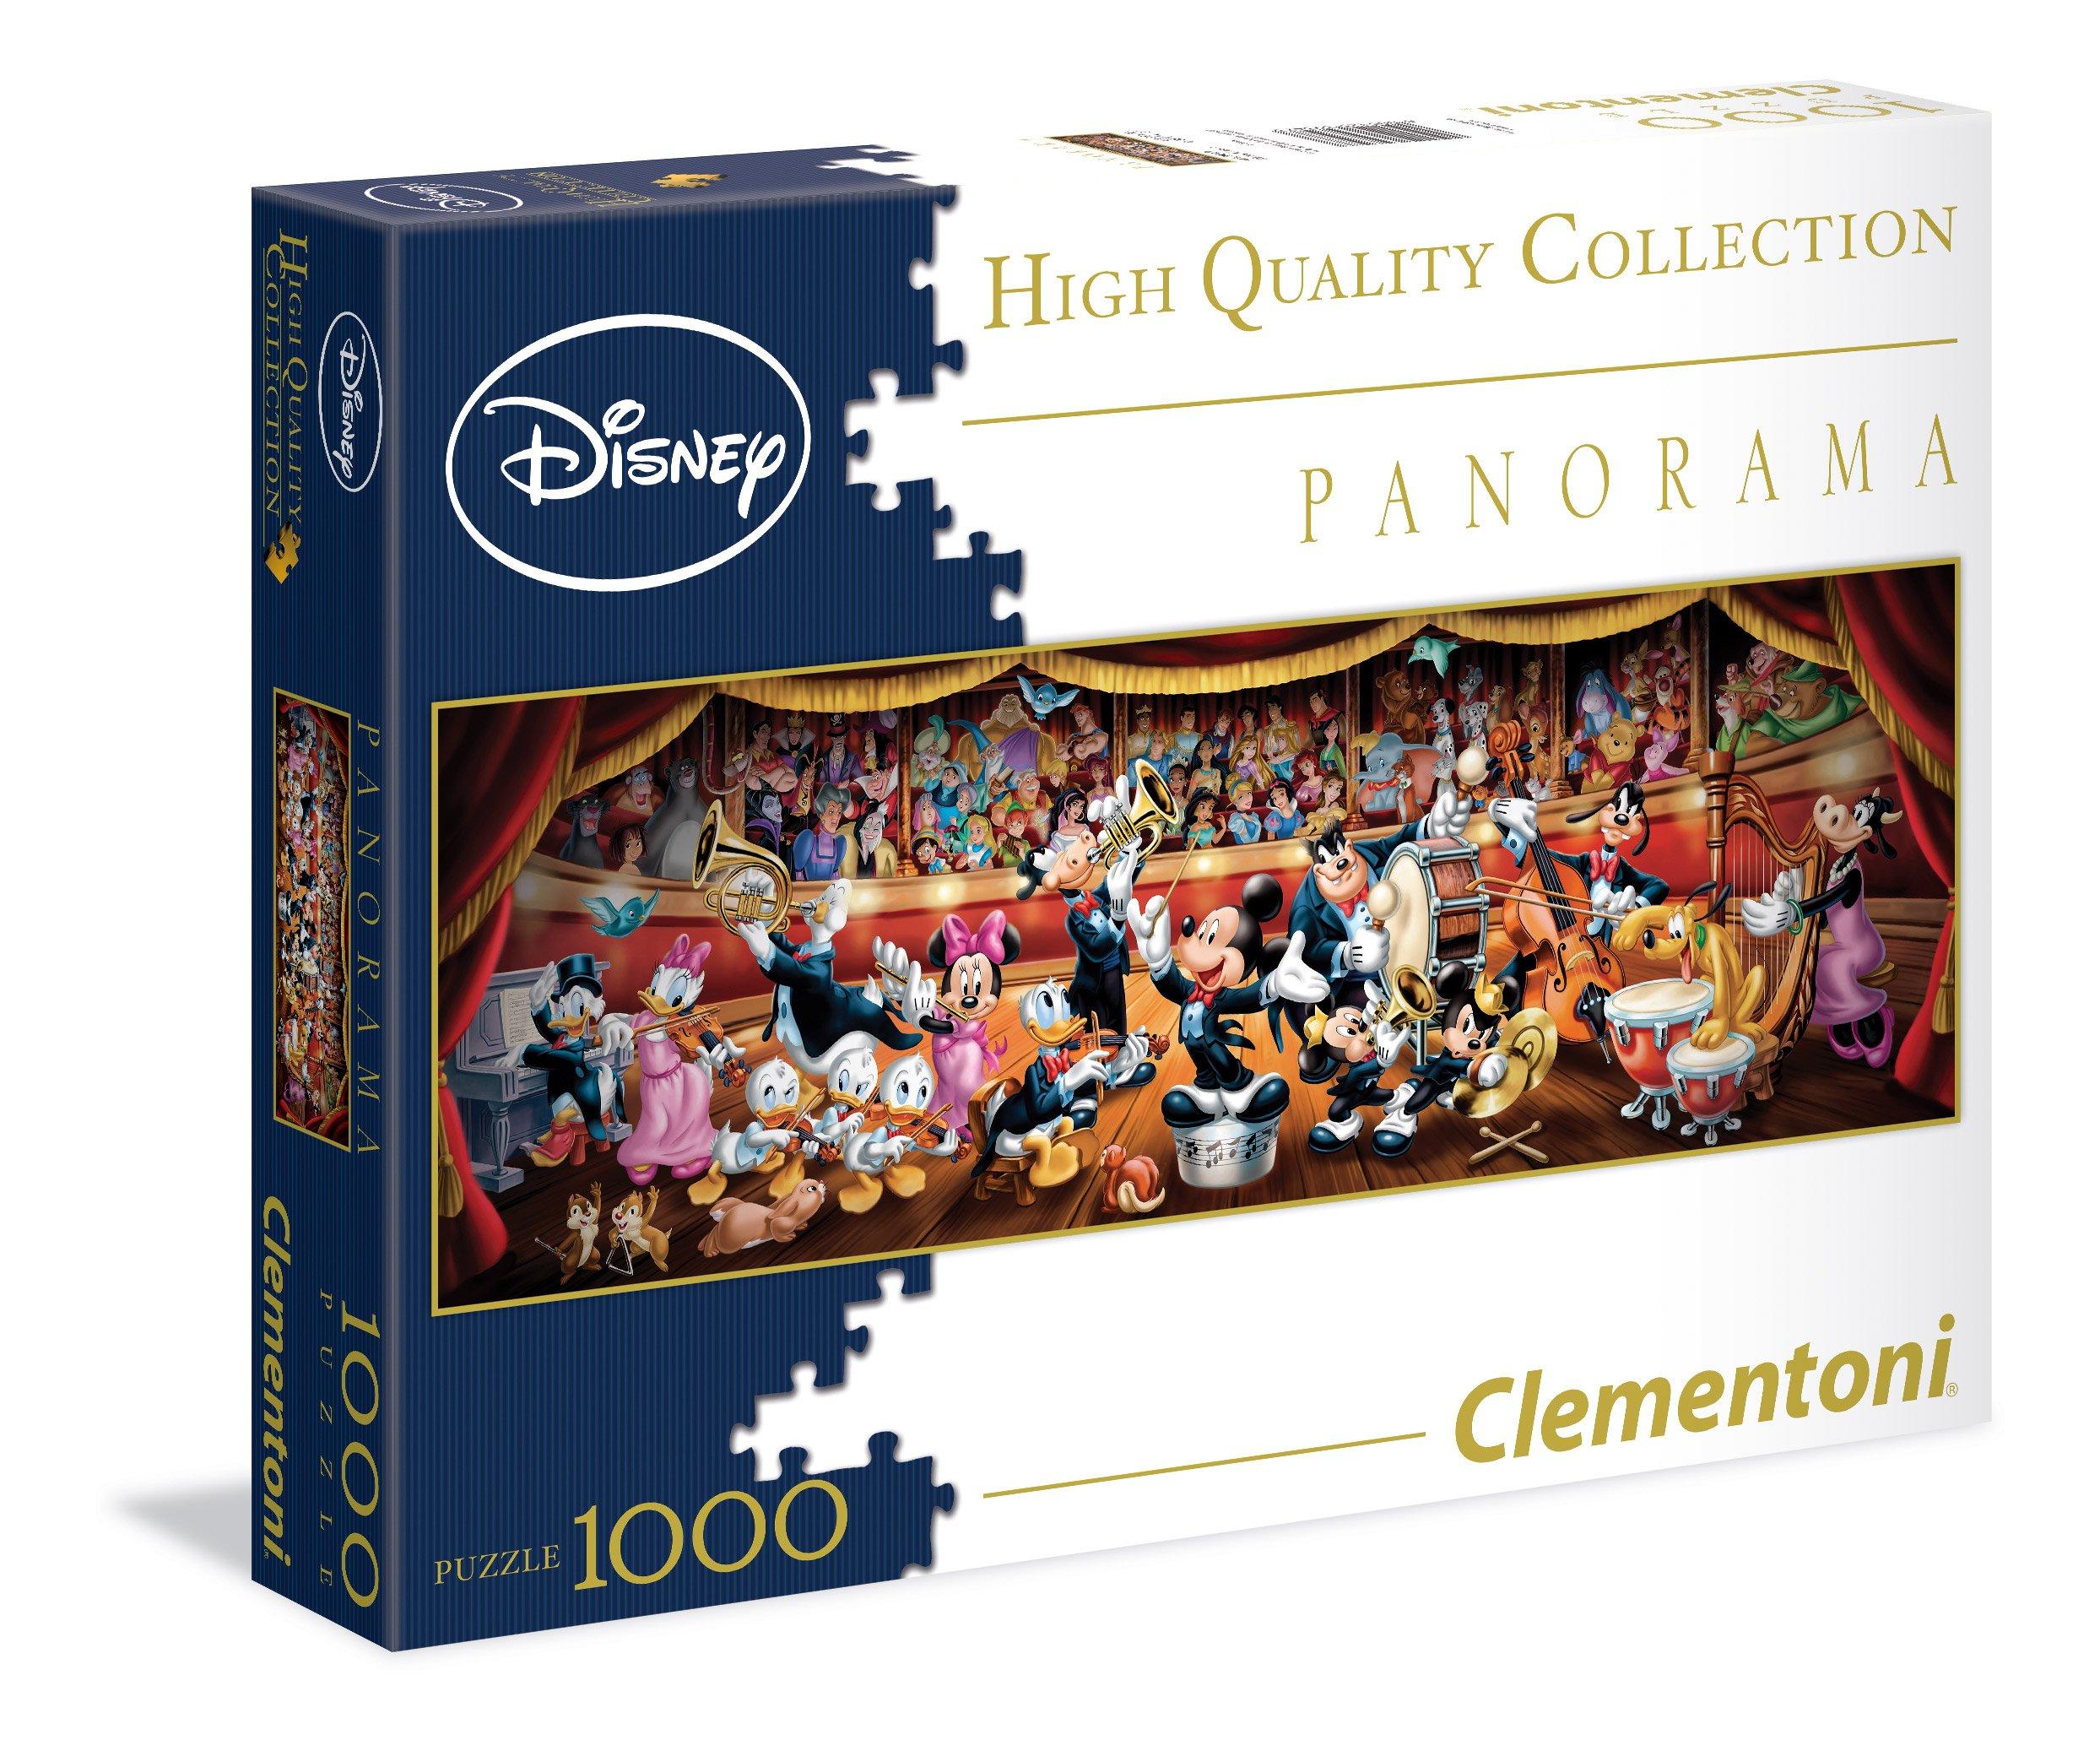 Disney Classic 1000 Piece Panorama Puzzle Children's Jigsaw Clementoni 12+